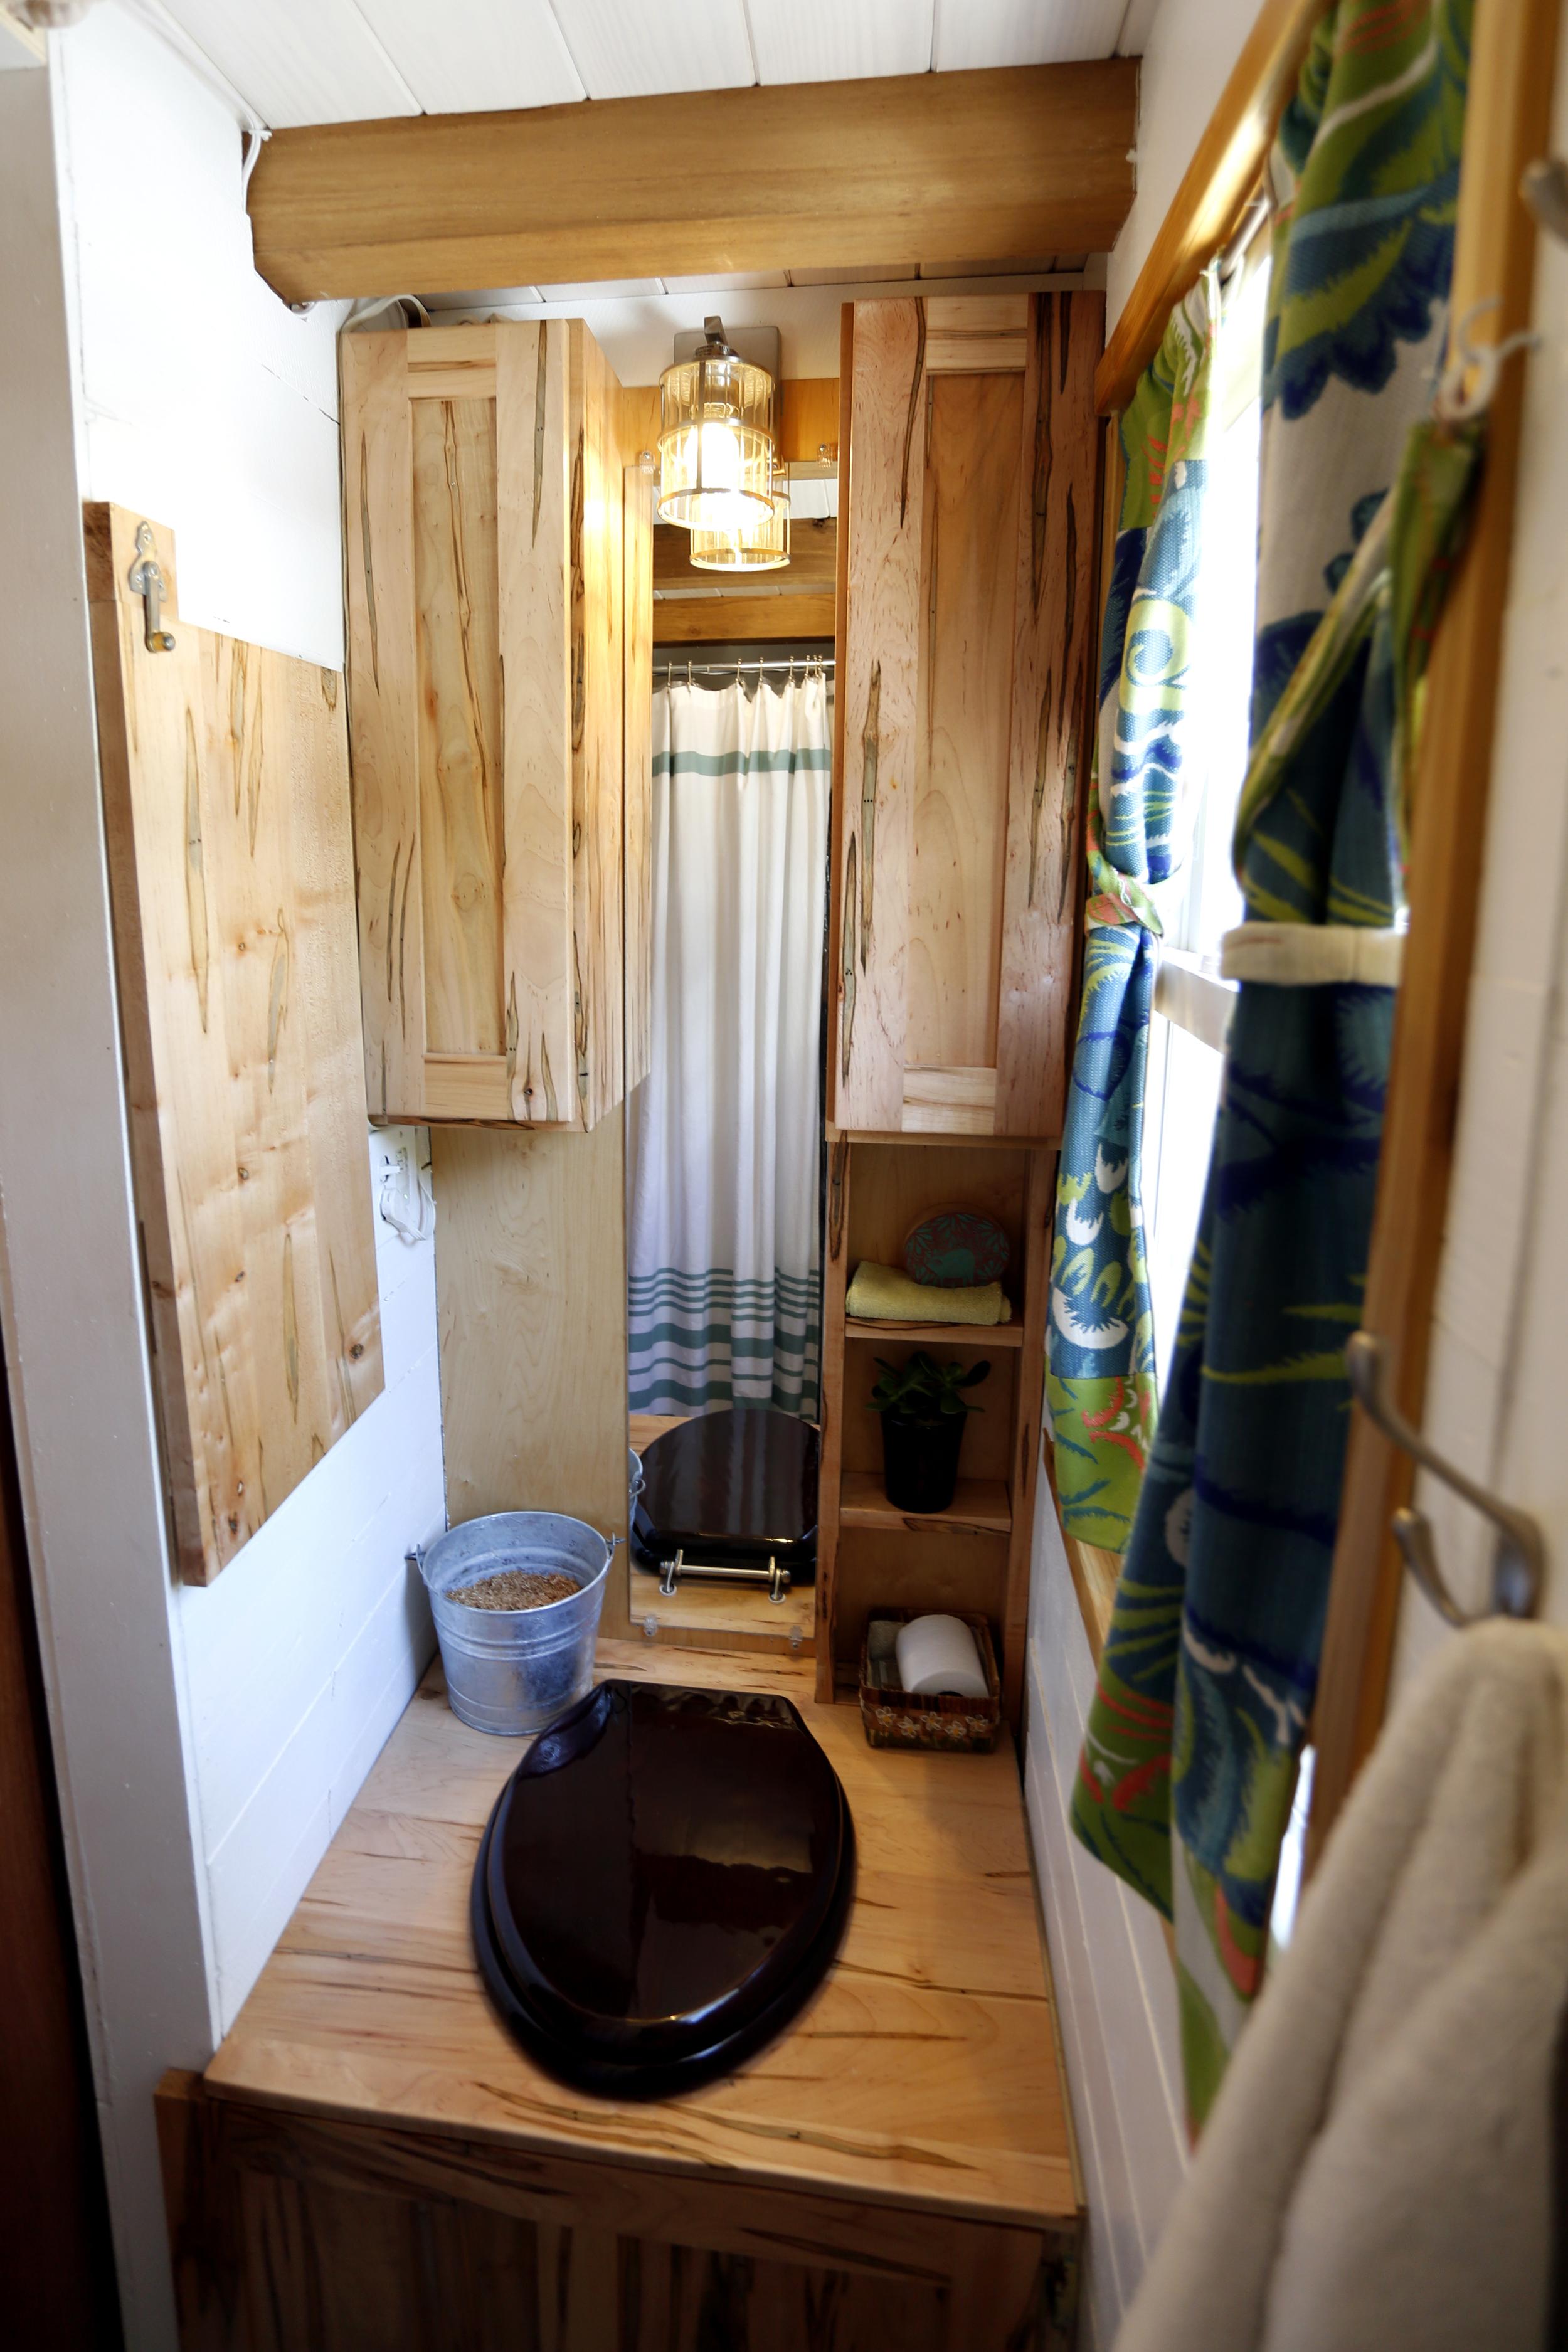 toilet_shelf_up.jpg